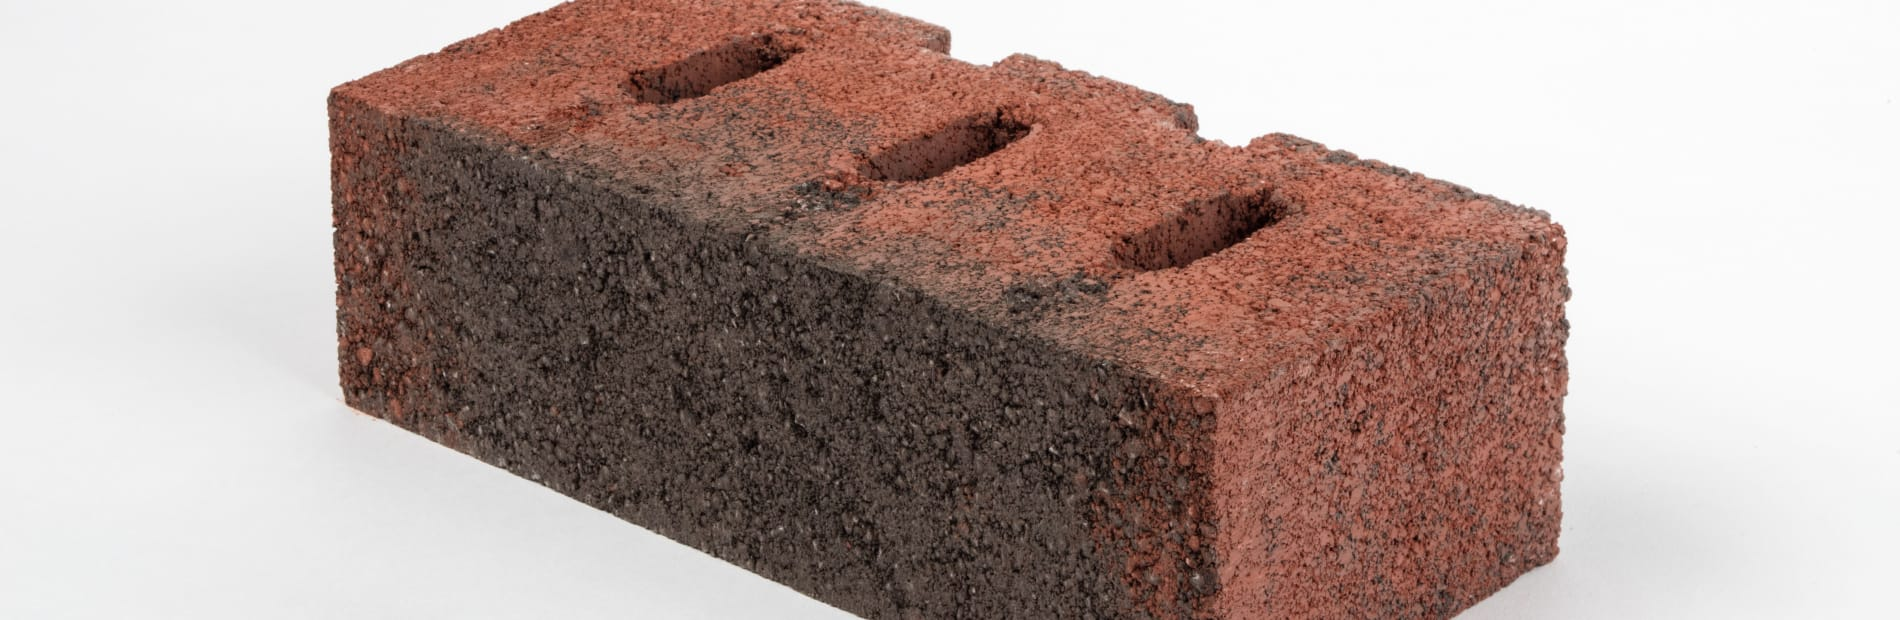 Fairway Woodspring Garnet Facing Brick